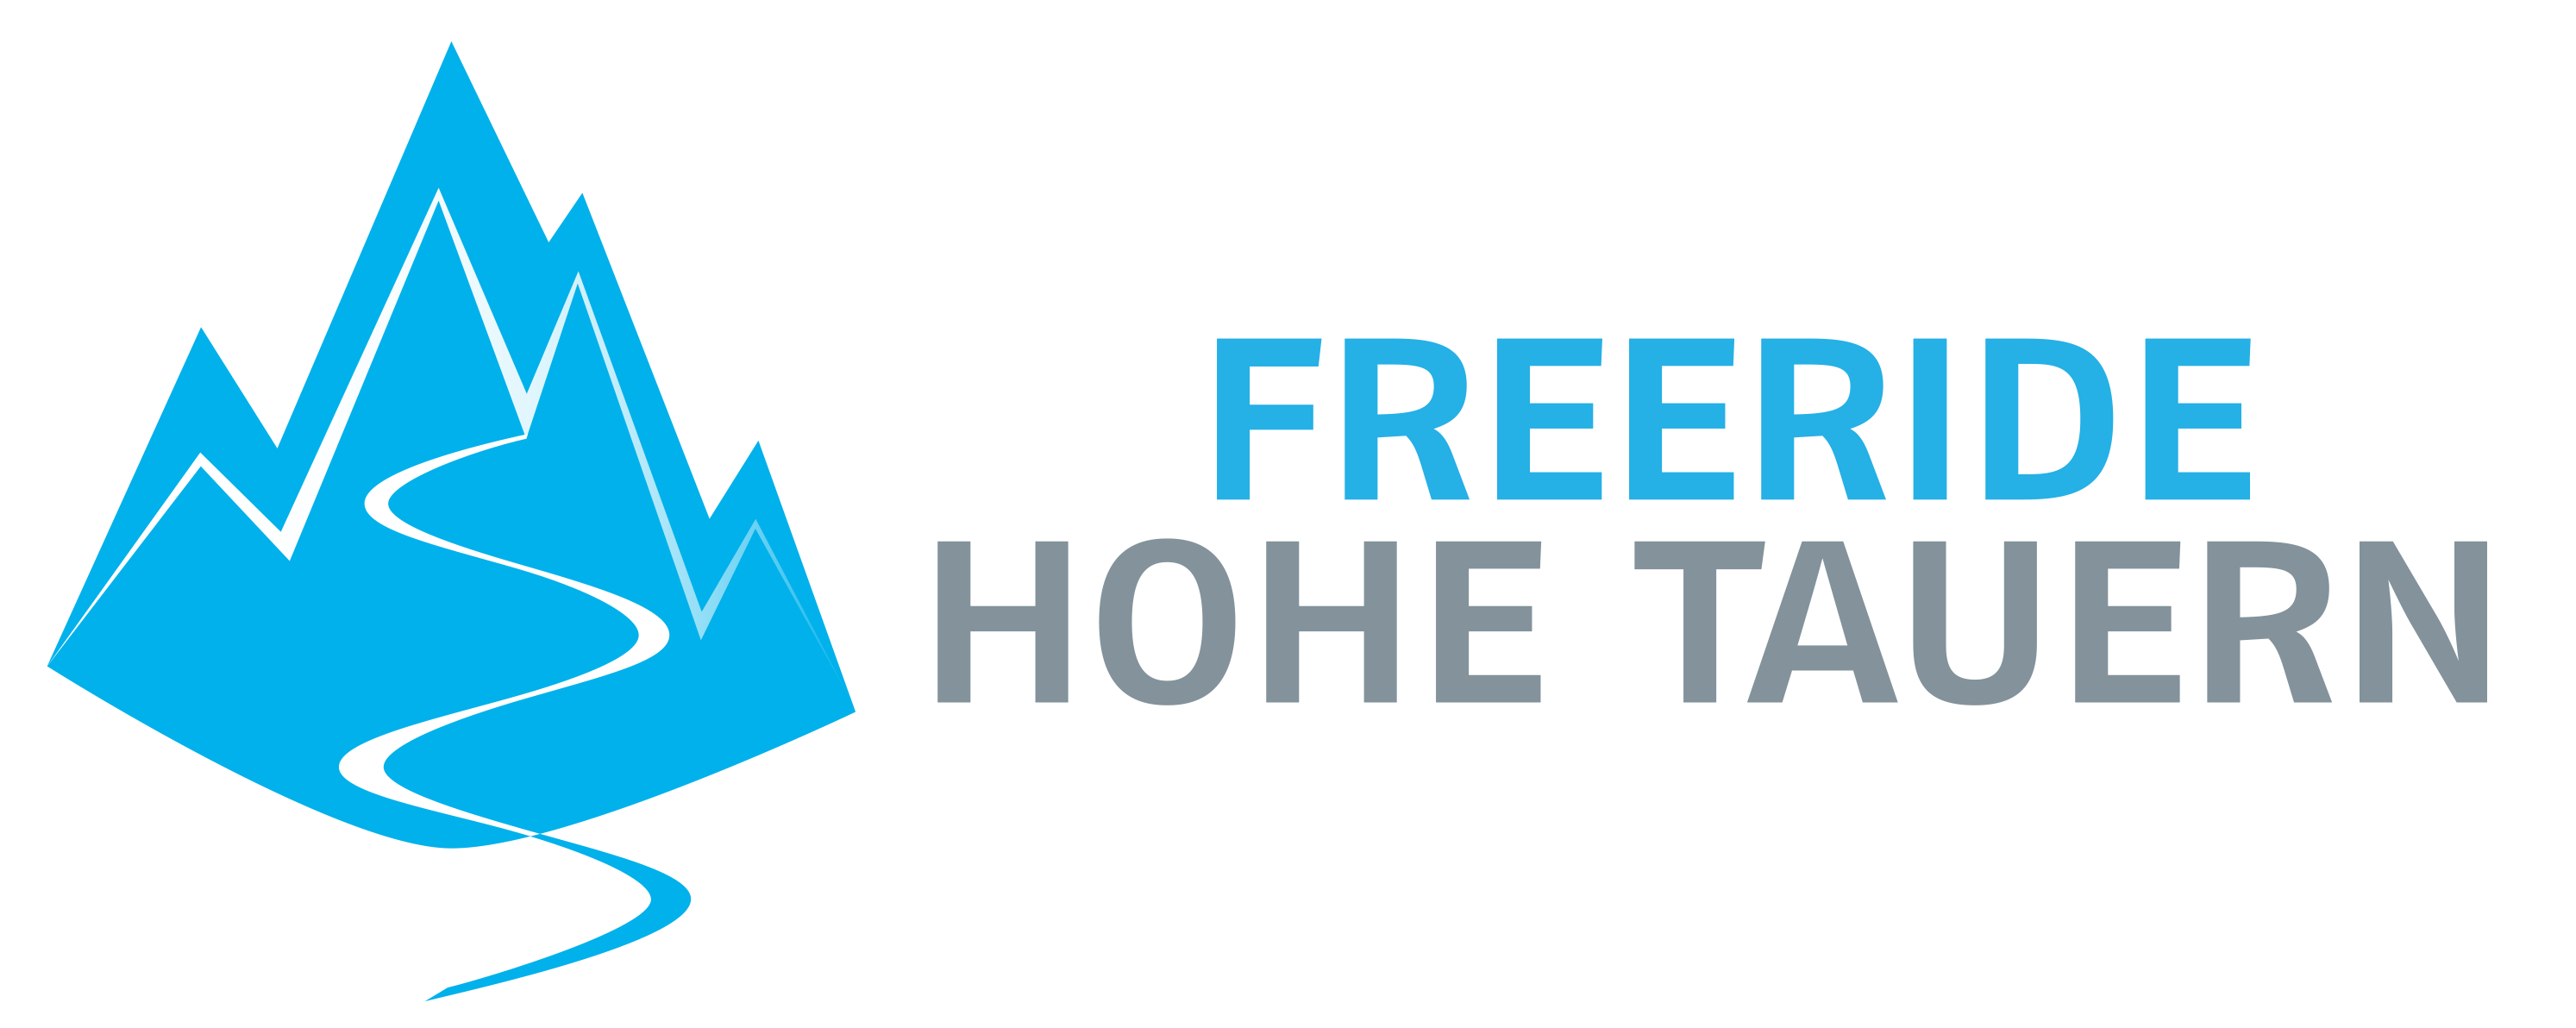 Freeride Hohe Tauern:  Freerideguides, Bergführer, Mölltaler Gletscher, Ankogel, Freeride, Mountainguide, Ski Teacher